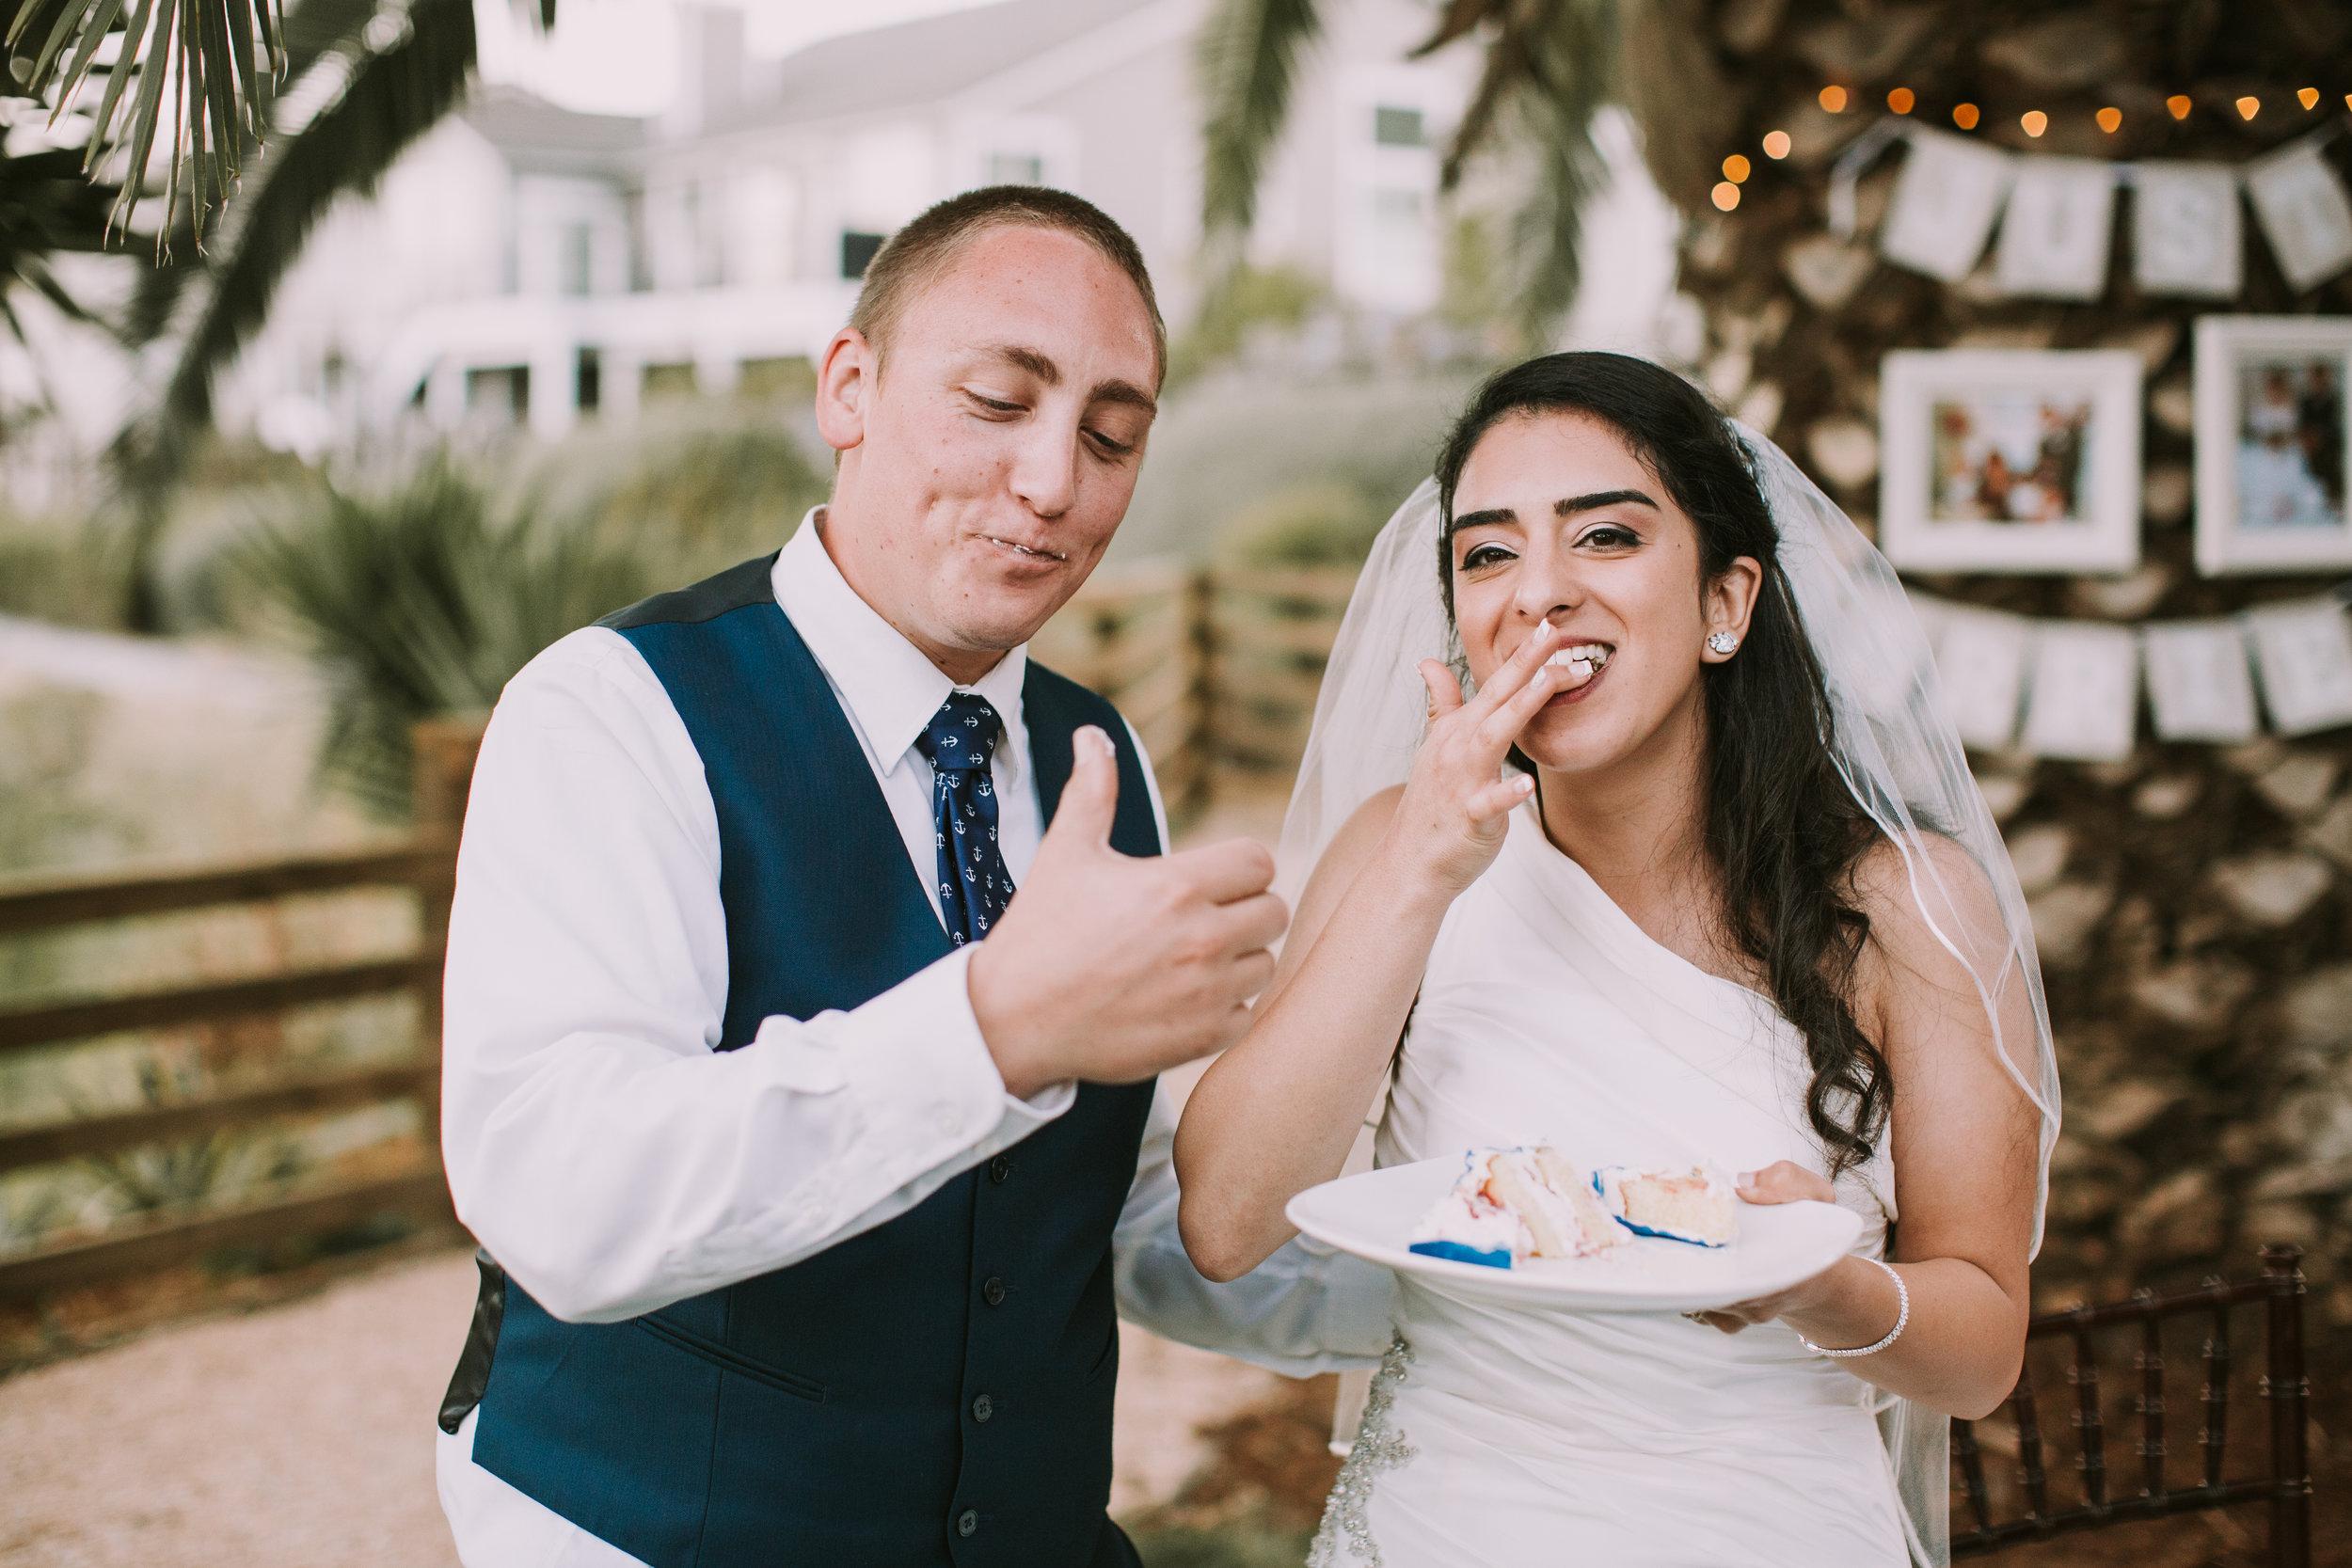 RYDER WEDDING-RYDER WEDDING 2-0156.jpg